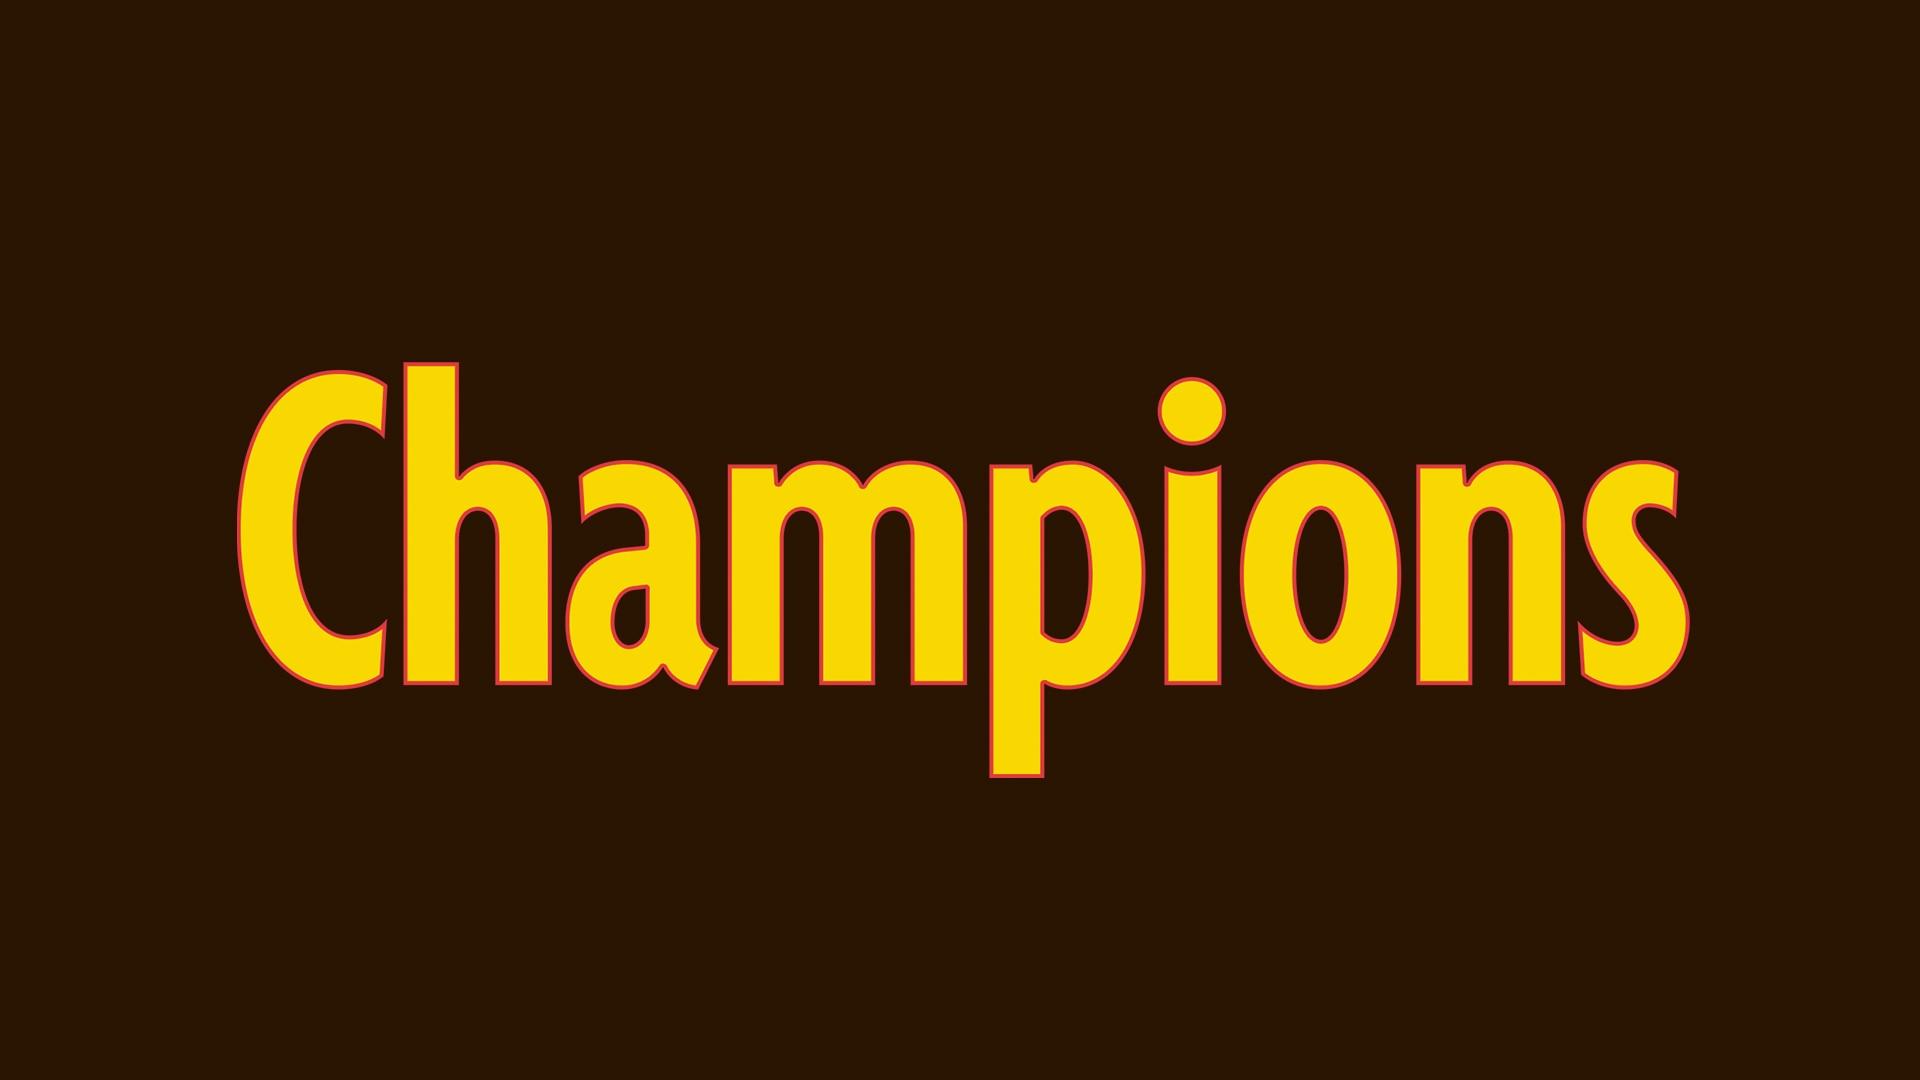 champions nbc com